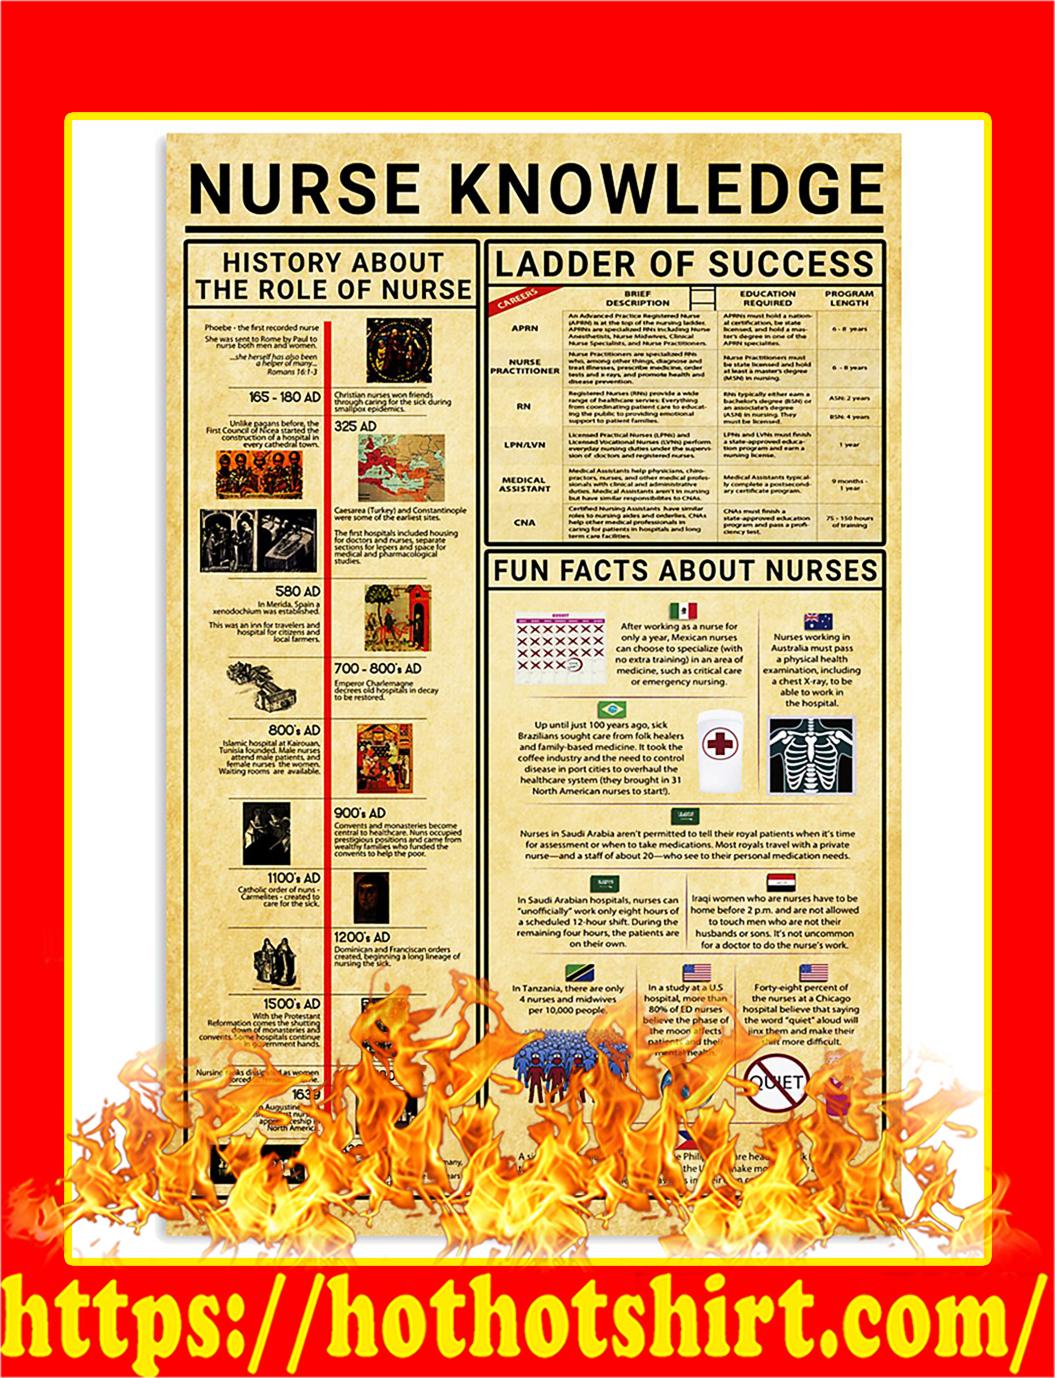 Nurse Knowledge Poster - A2